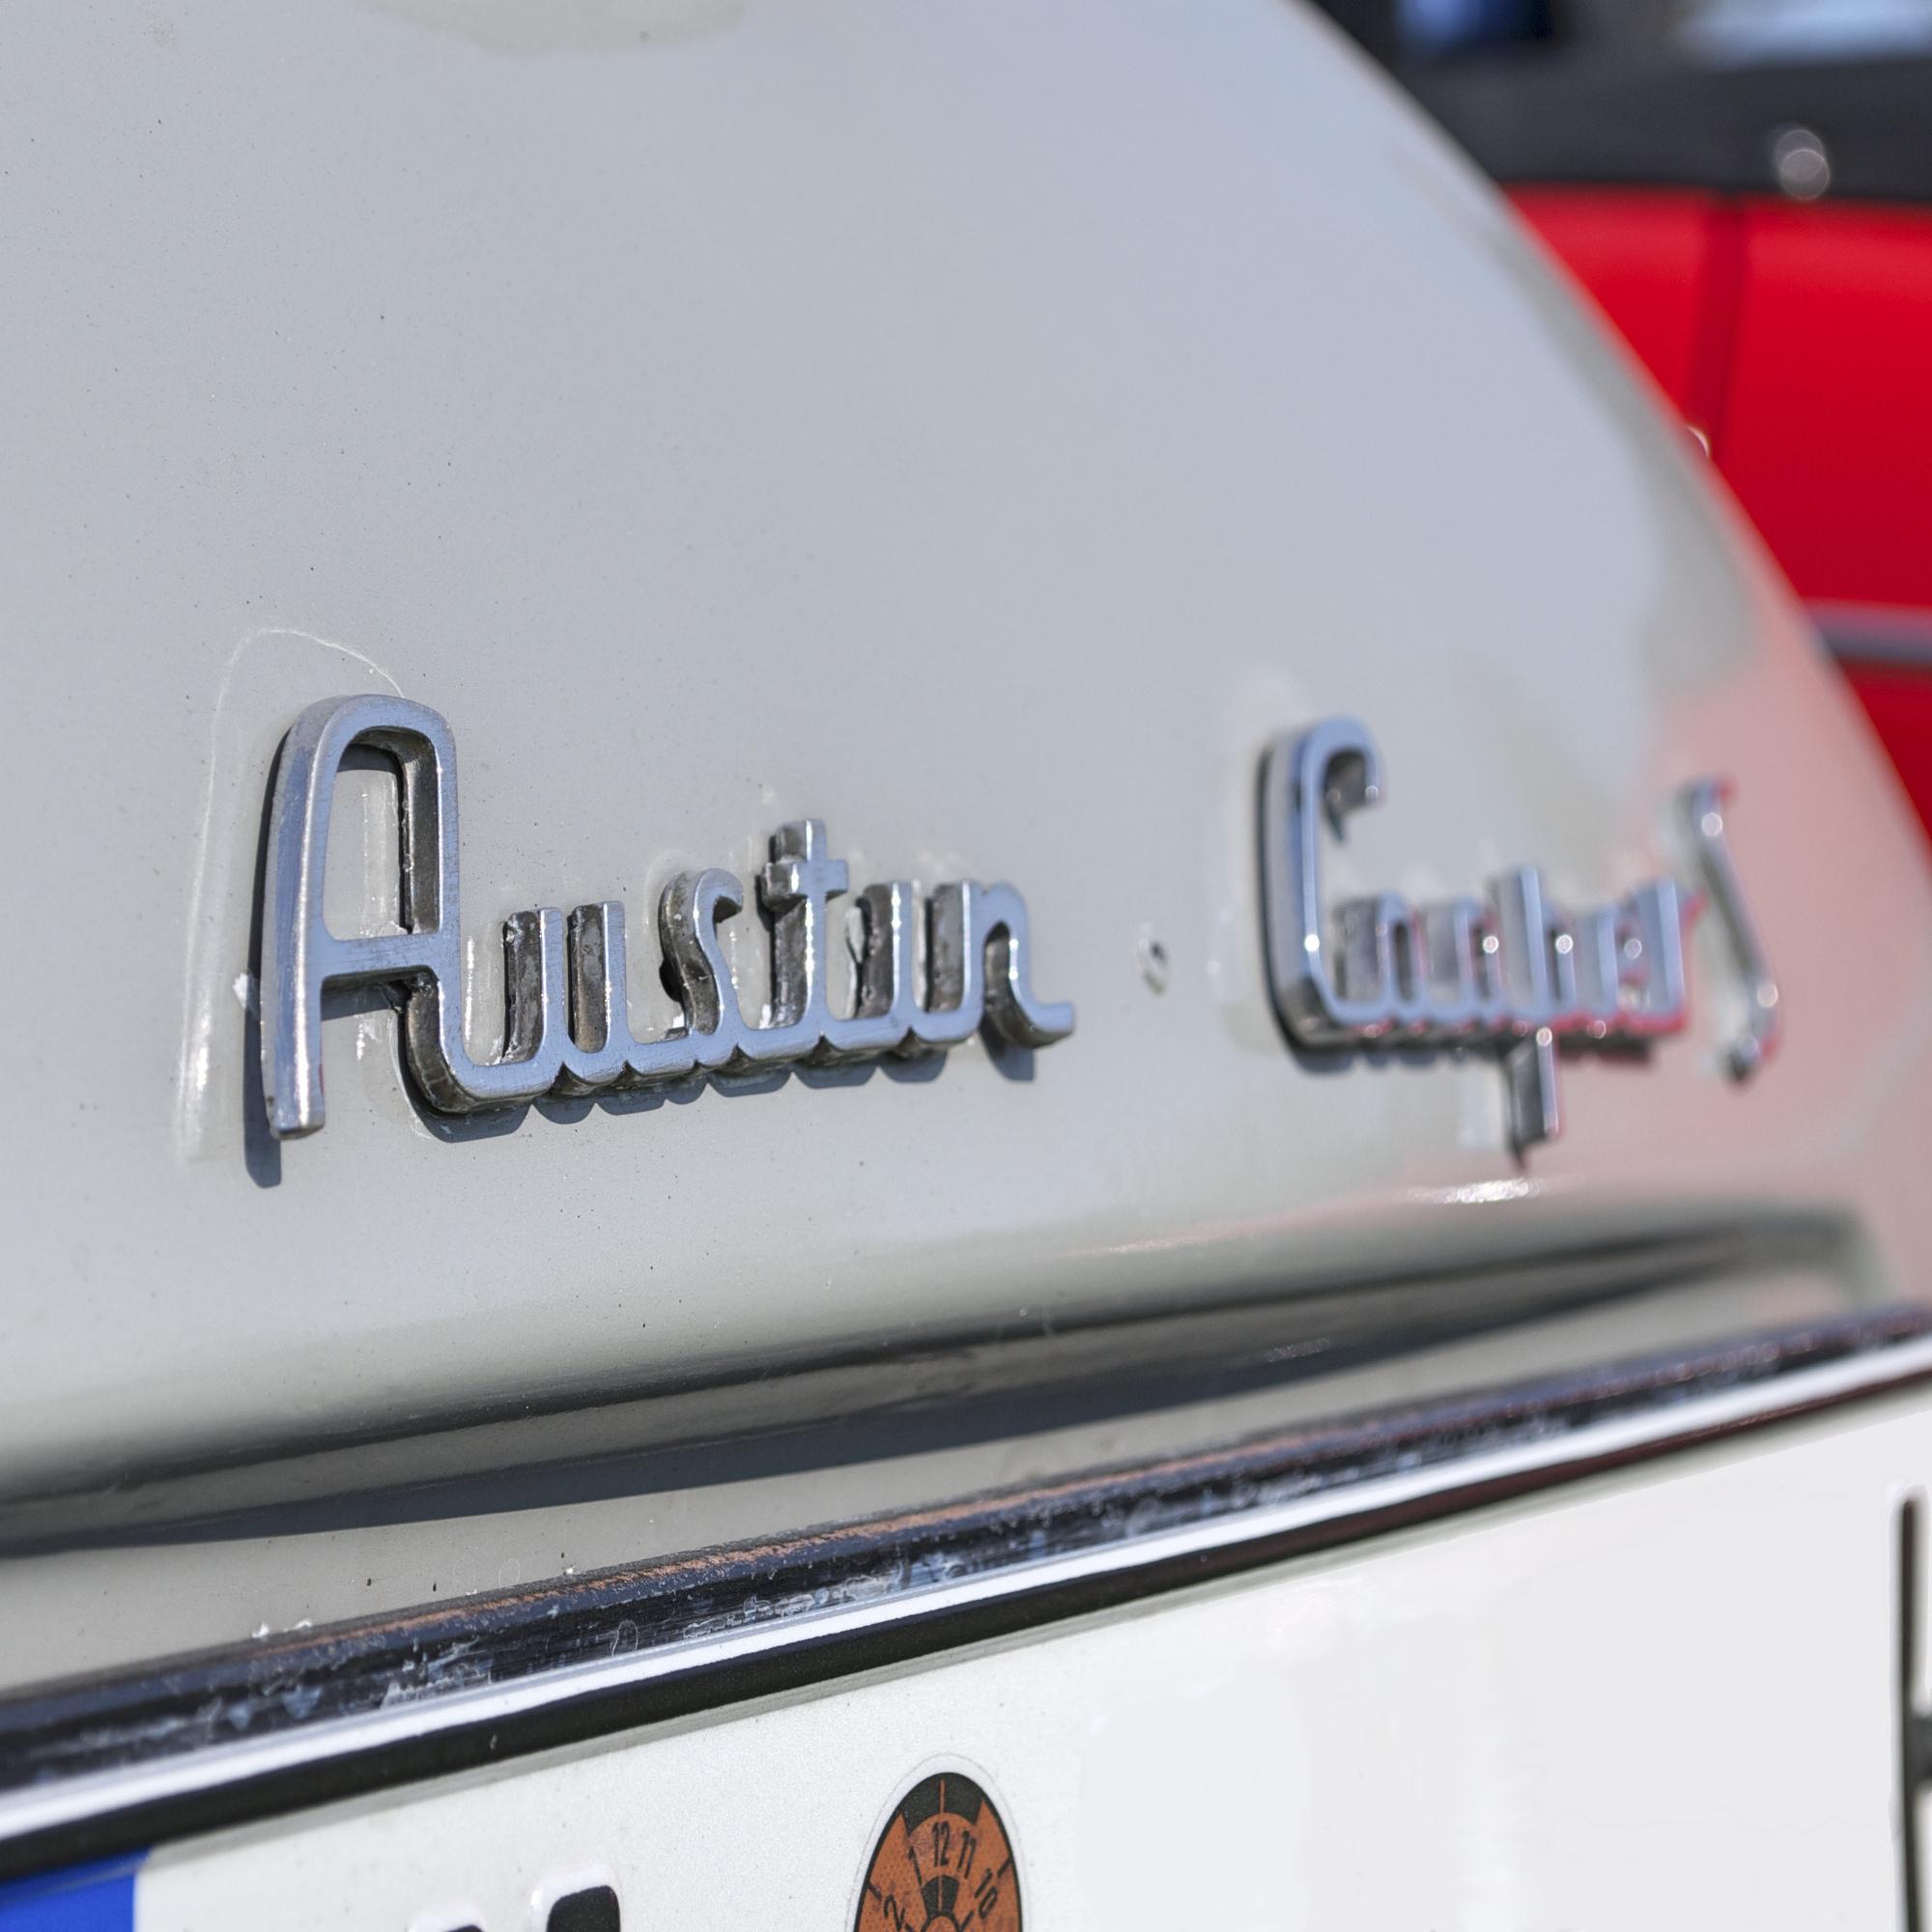 Austin Cooper S